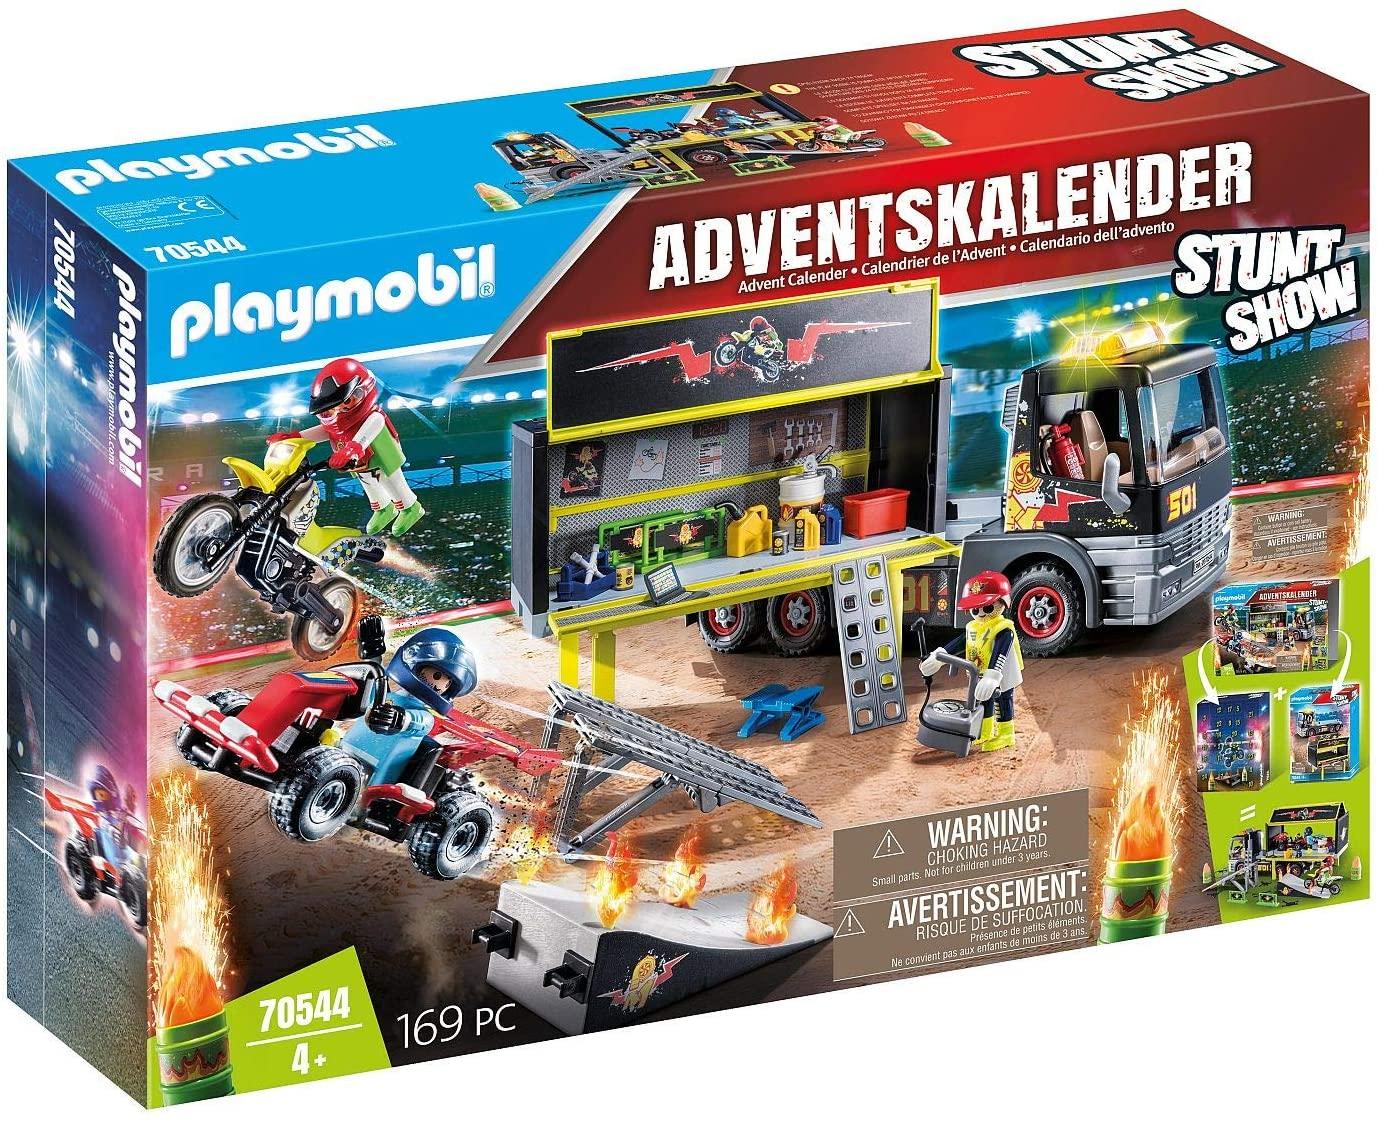 Playmobil XXL adventskalender 70544 Stuntshow @ Amazon.nl